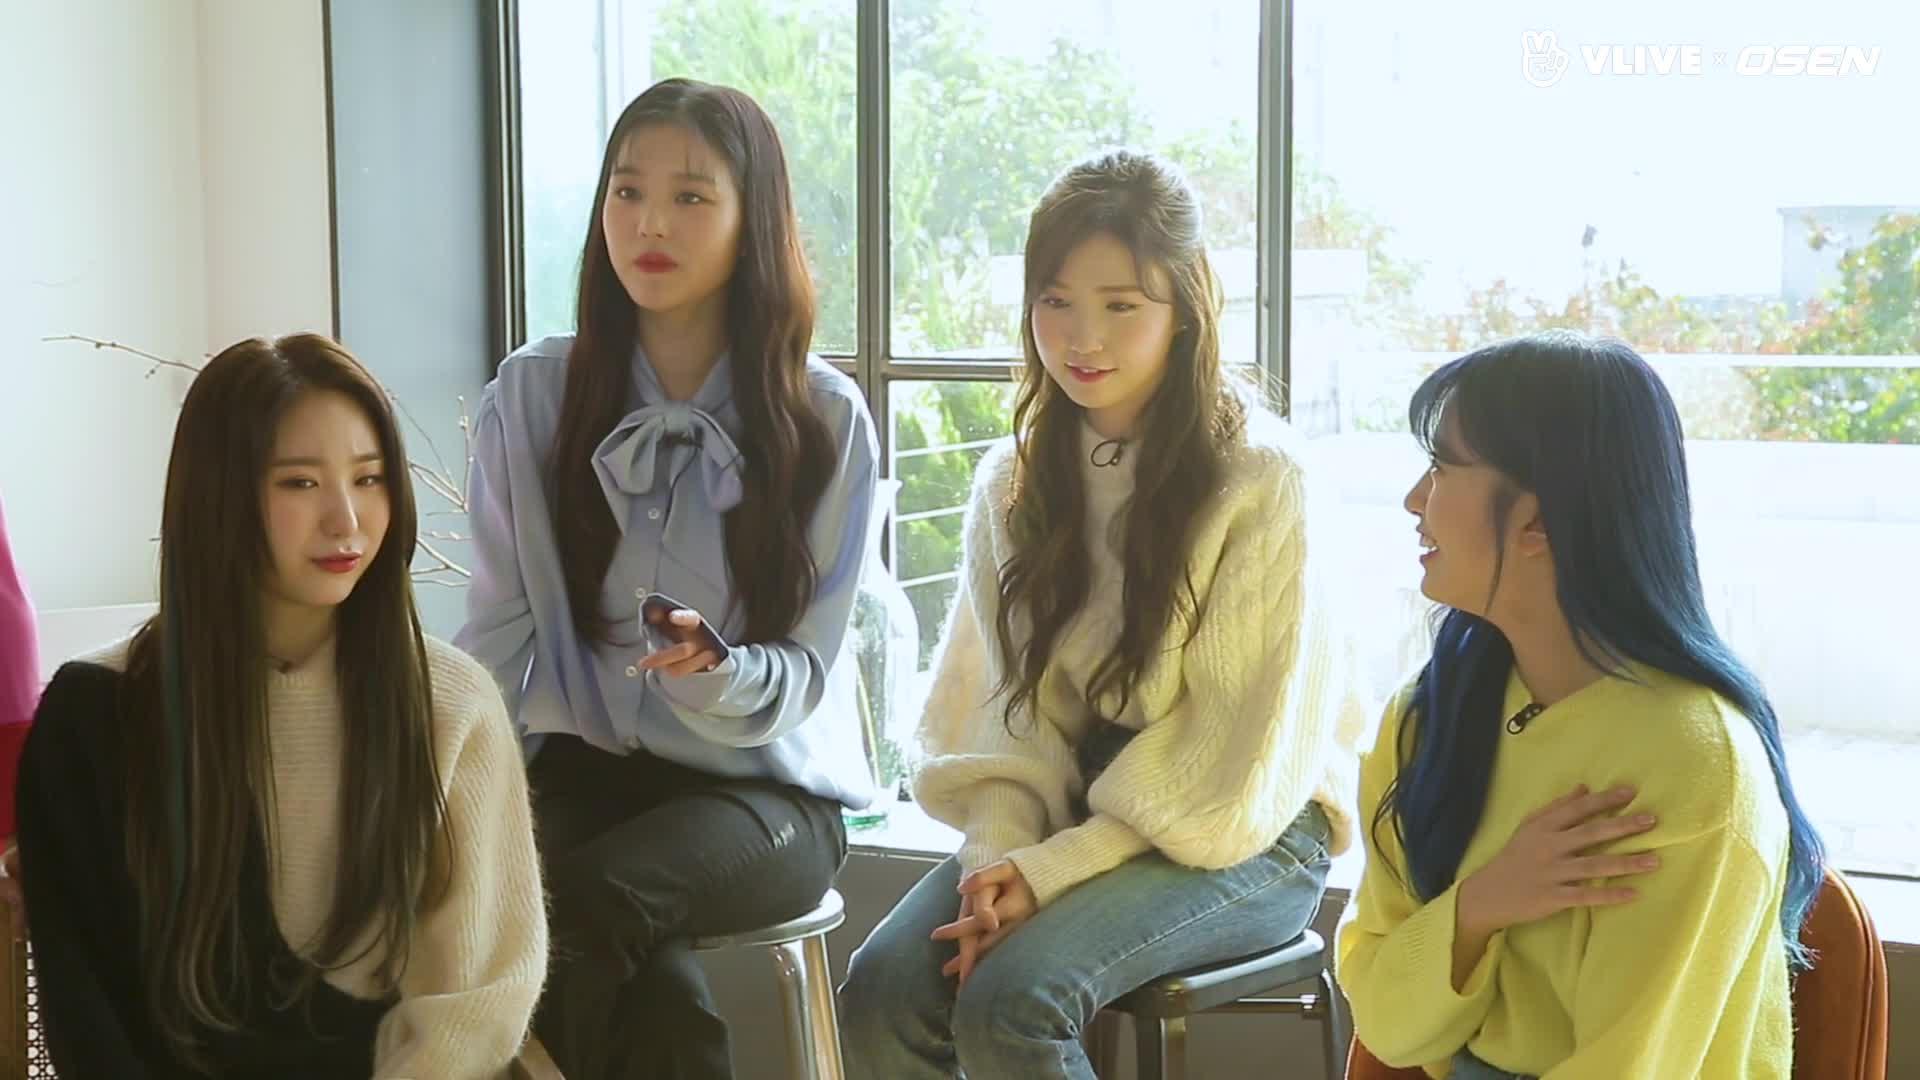 IZ*ONE 아이즈원, 'La Vie en Rose' 비하인드 대공개 #스타로드 07